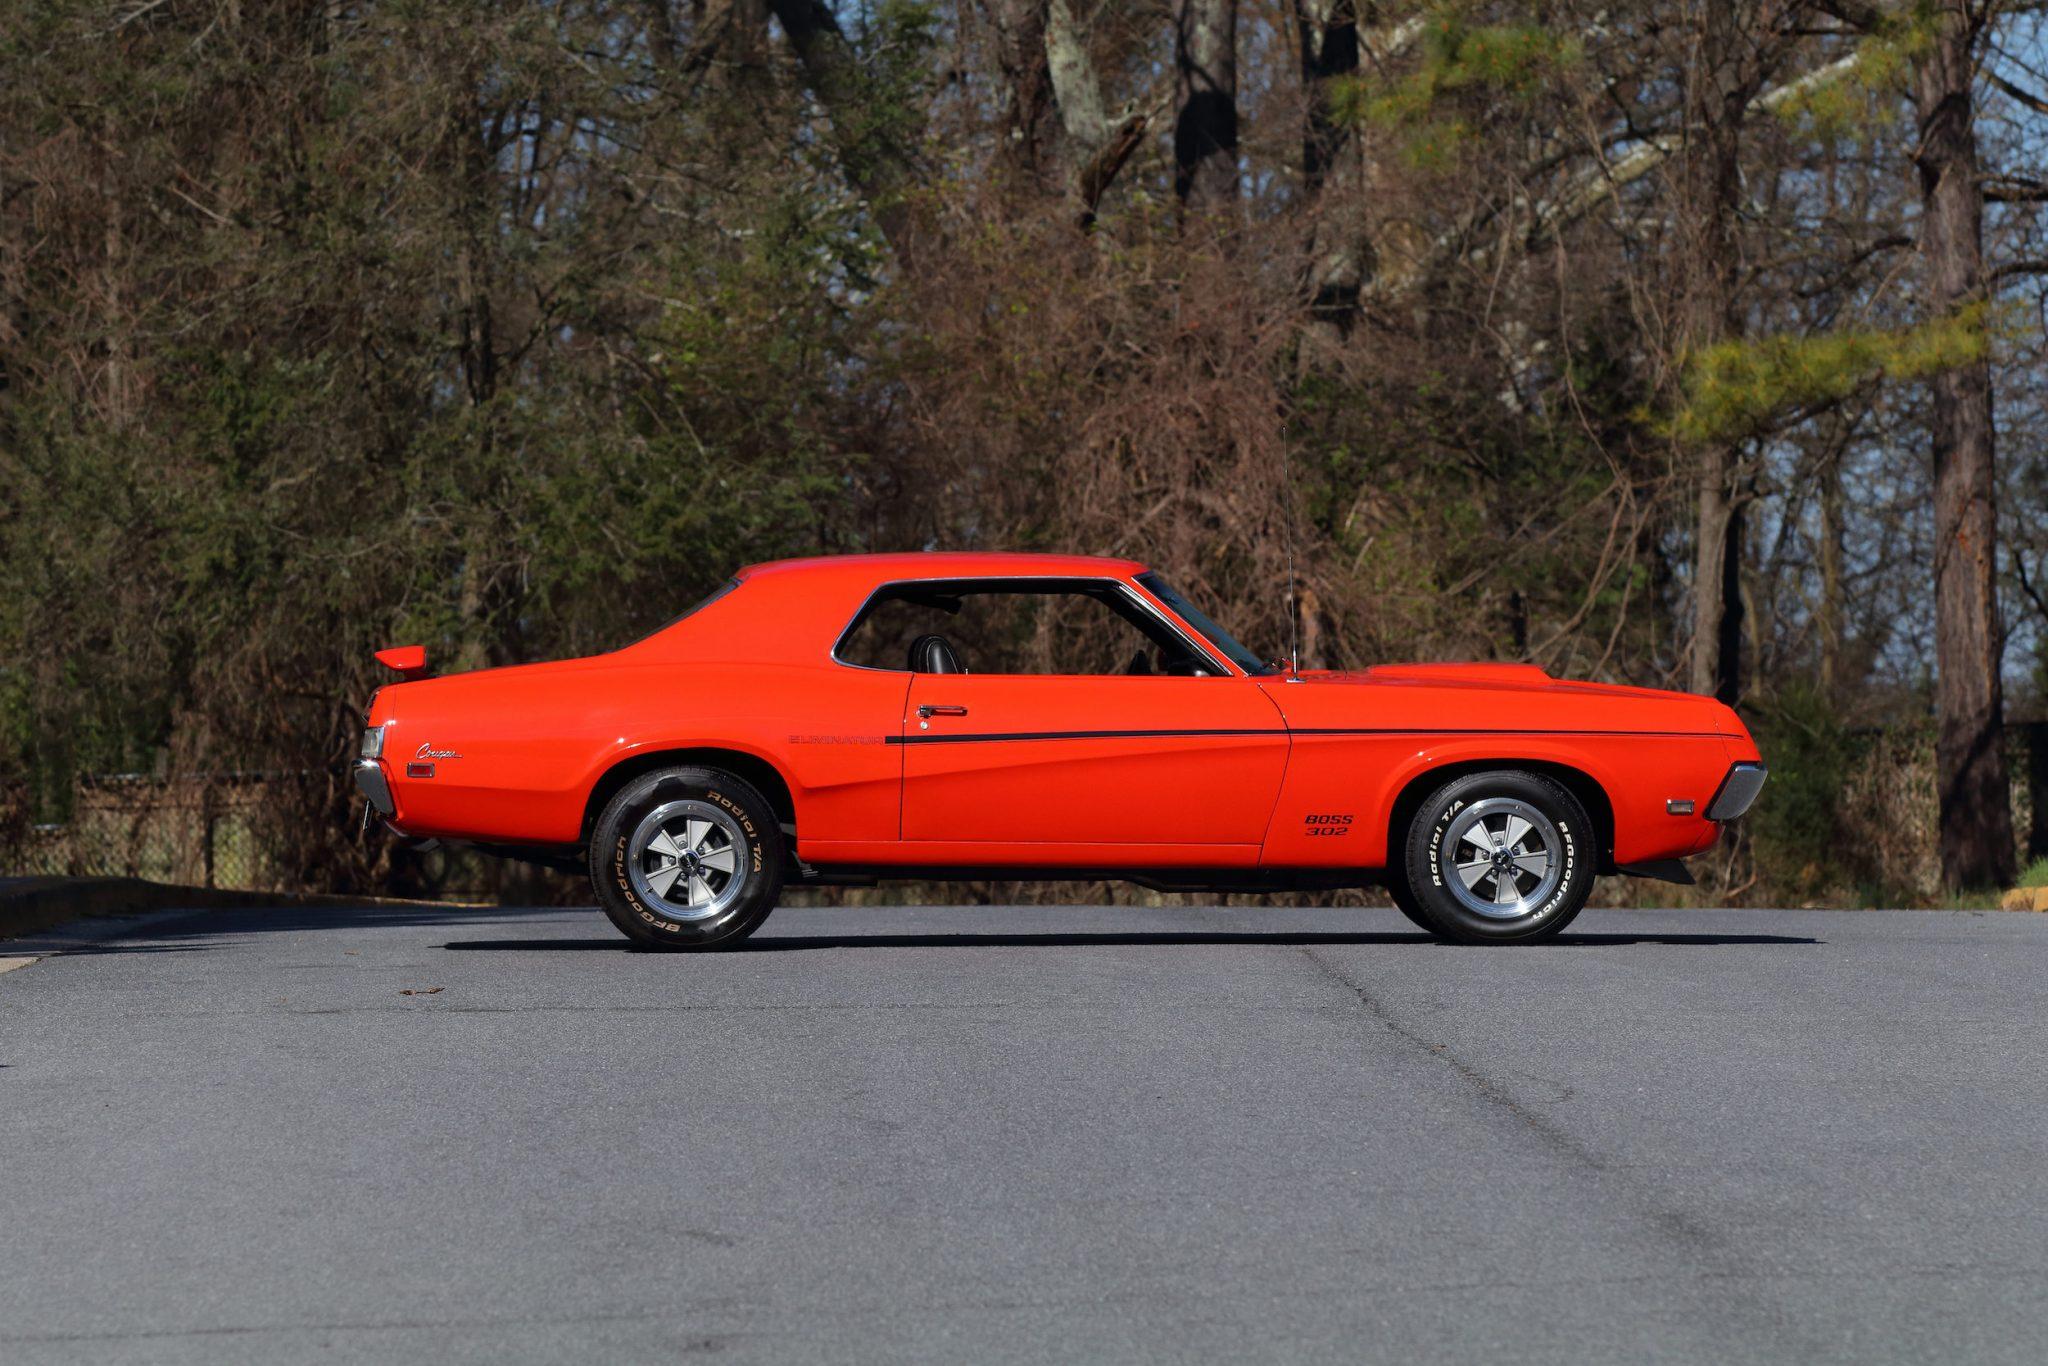 1969 mercury cougar boss 302photo credits dan duckworth, courtesy of mecum auctions